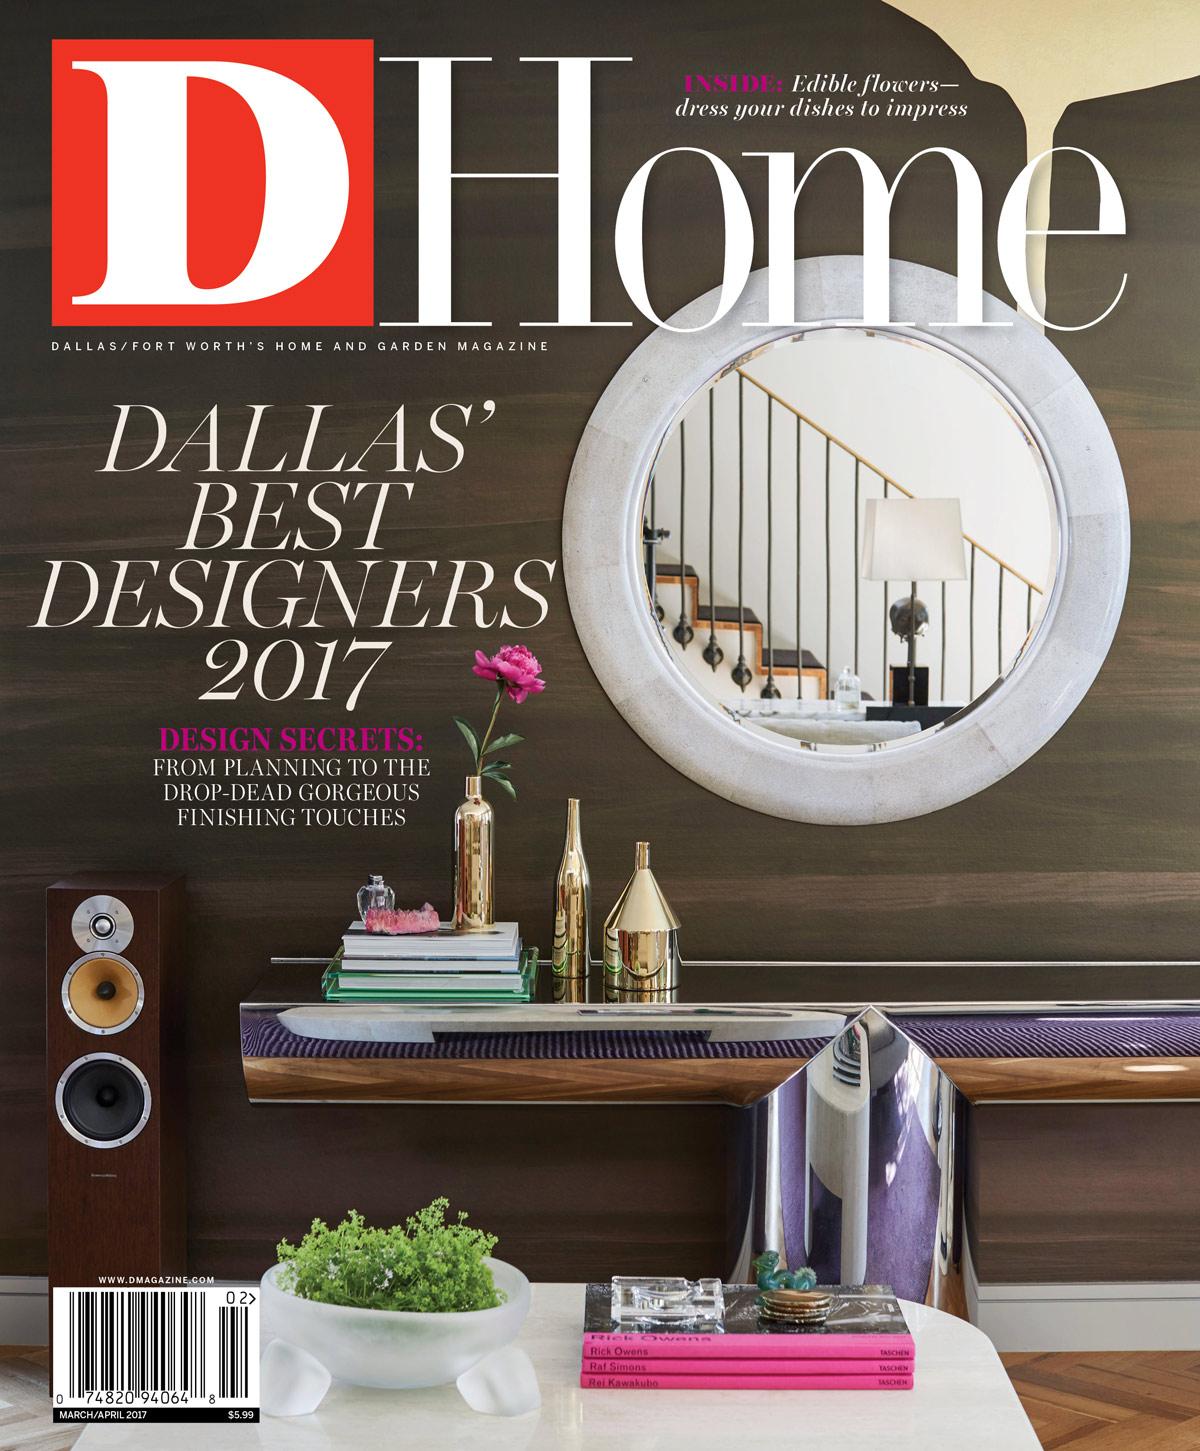 March-April 2017 cover